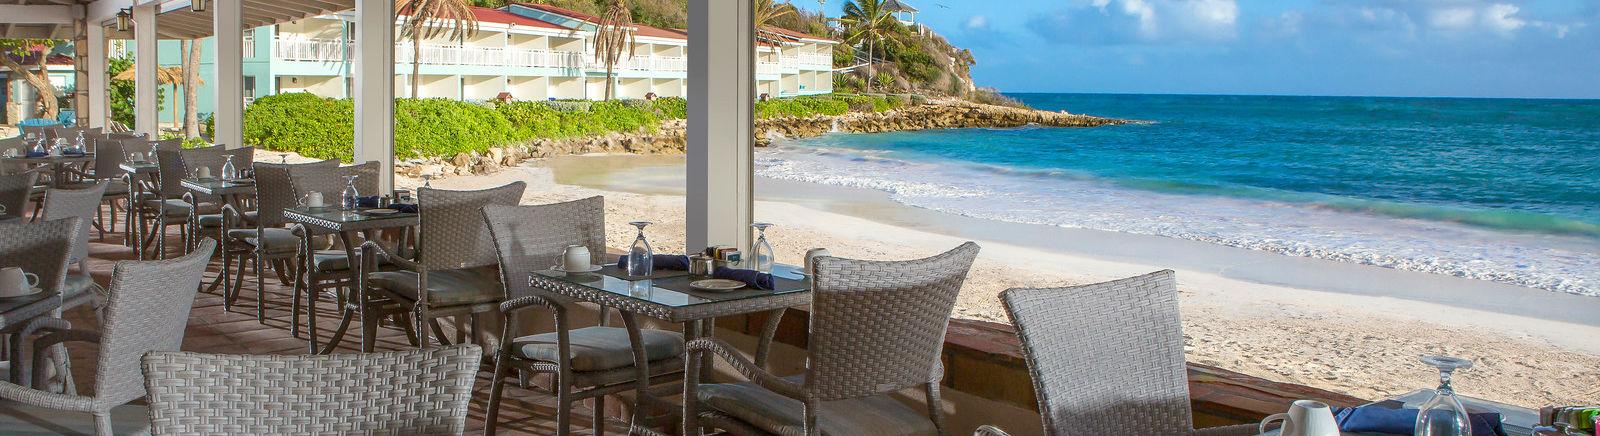 Dining lounge on the beach at the Pineapple Beach Club, Antigua